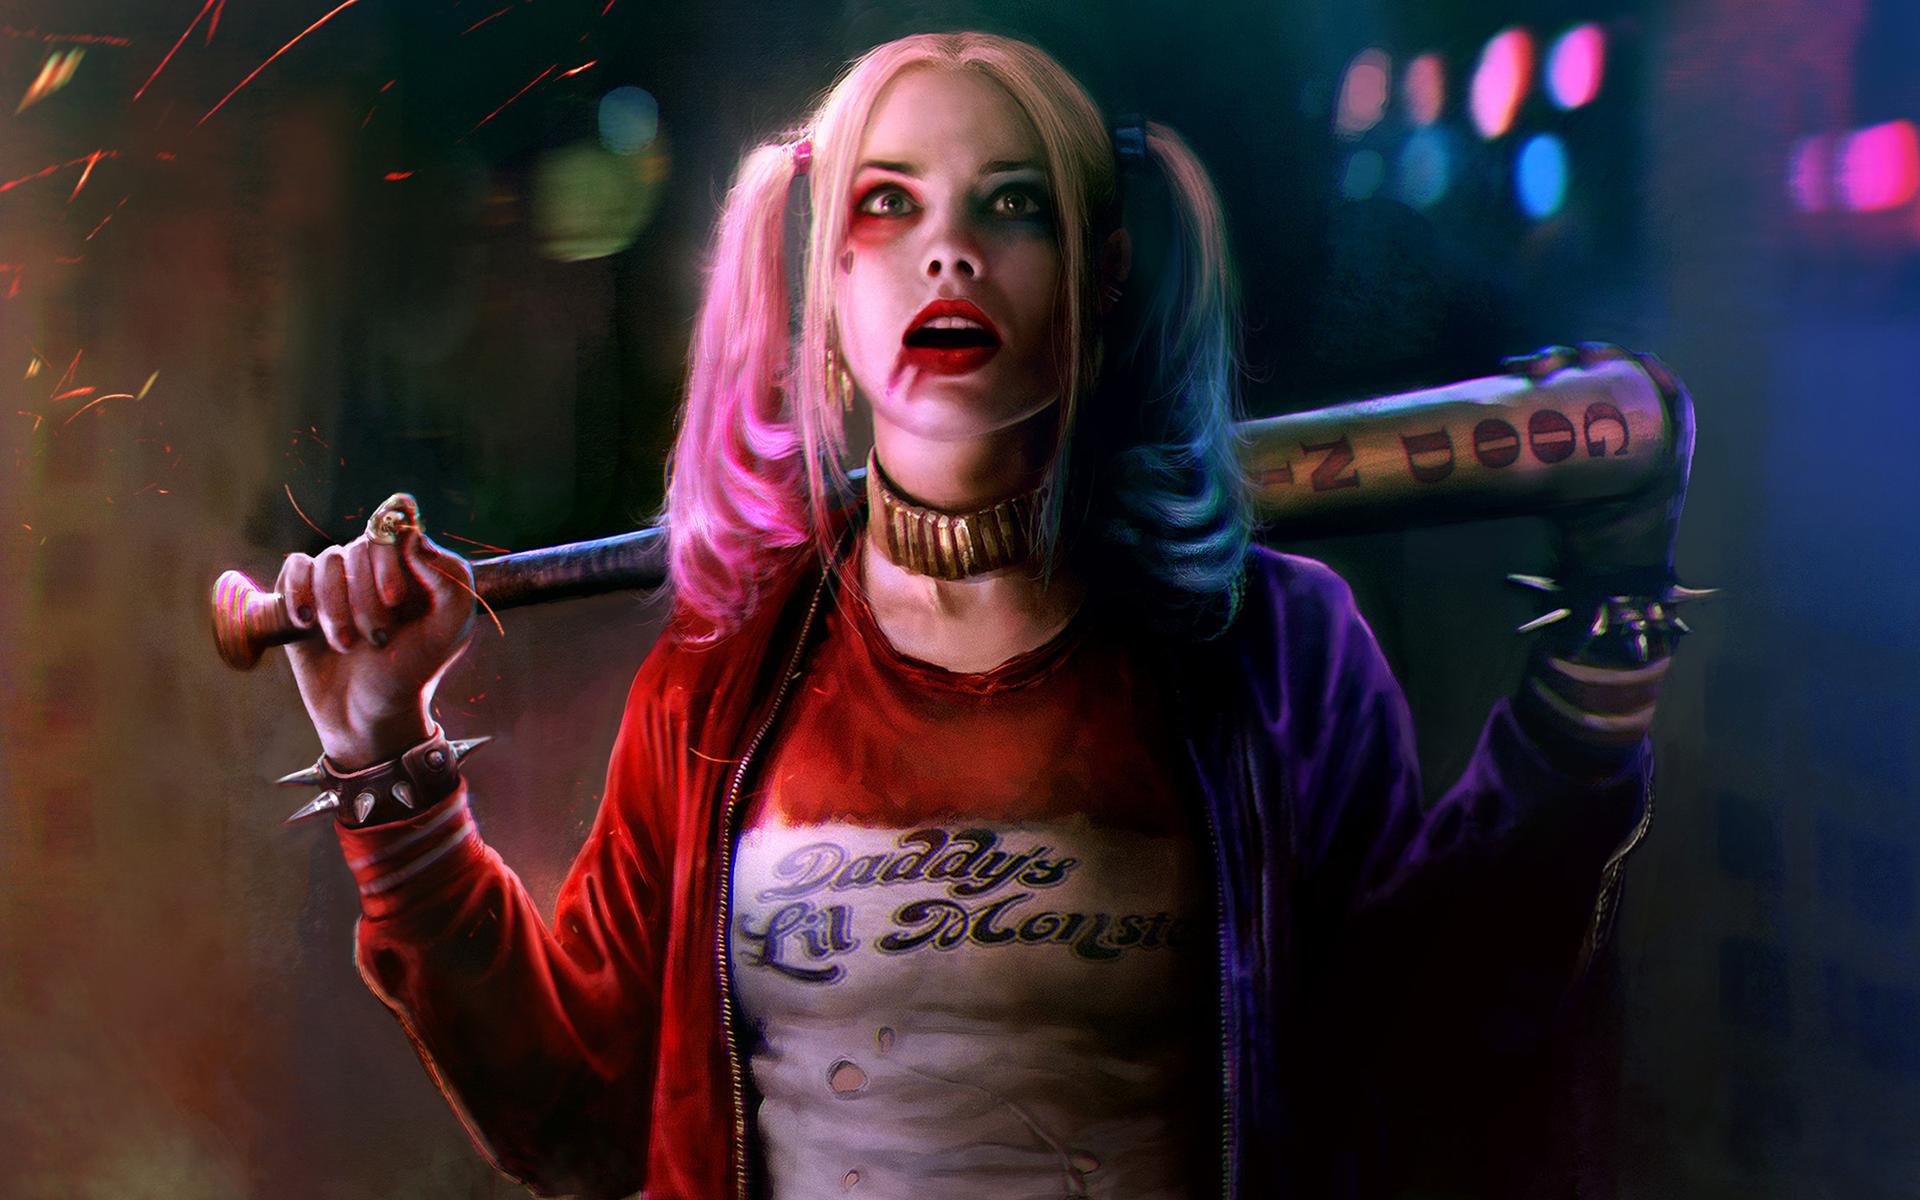 Margot Robbie As Harley Quinn Wallpaper HD Wallpapers 1920x1200